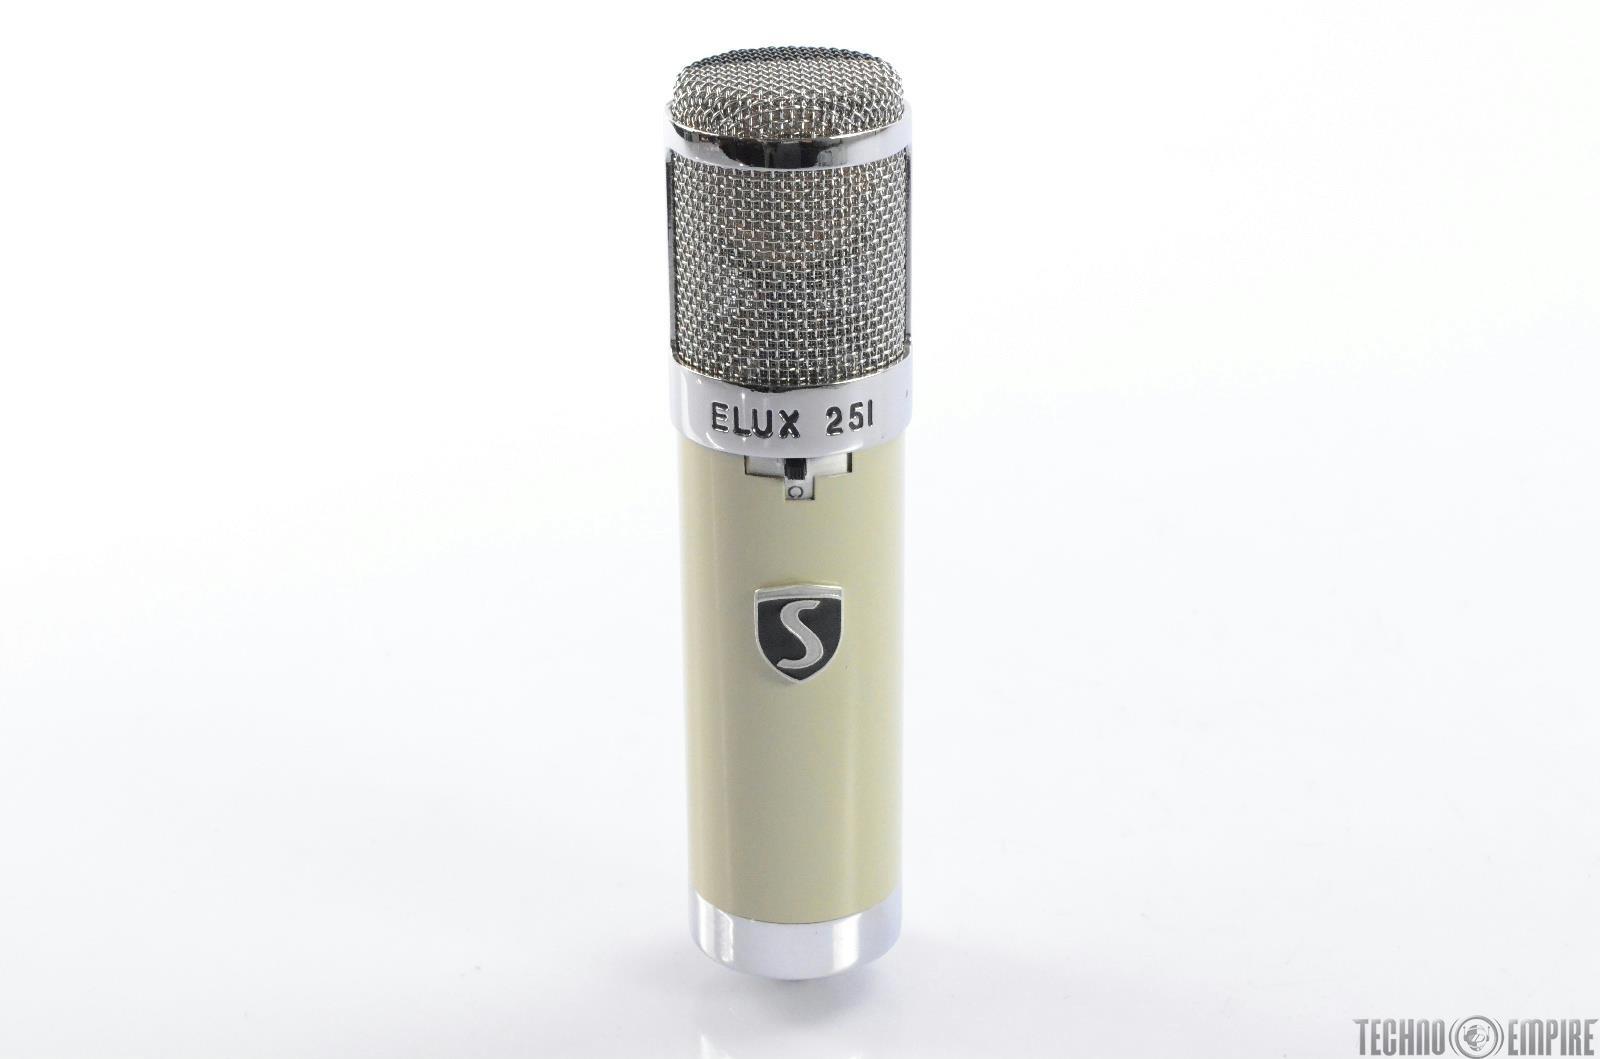 Soundelux ELUX 251 Large Diaphragm Tube Microphone Grandmaster Recorders #28734